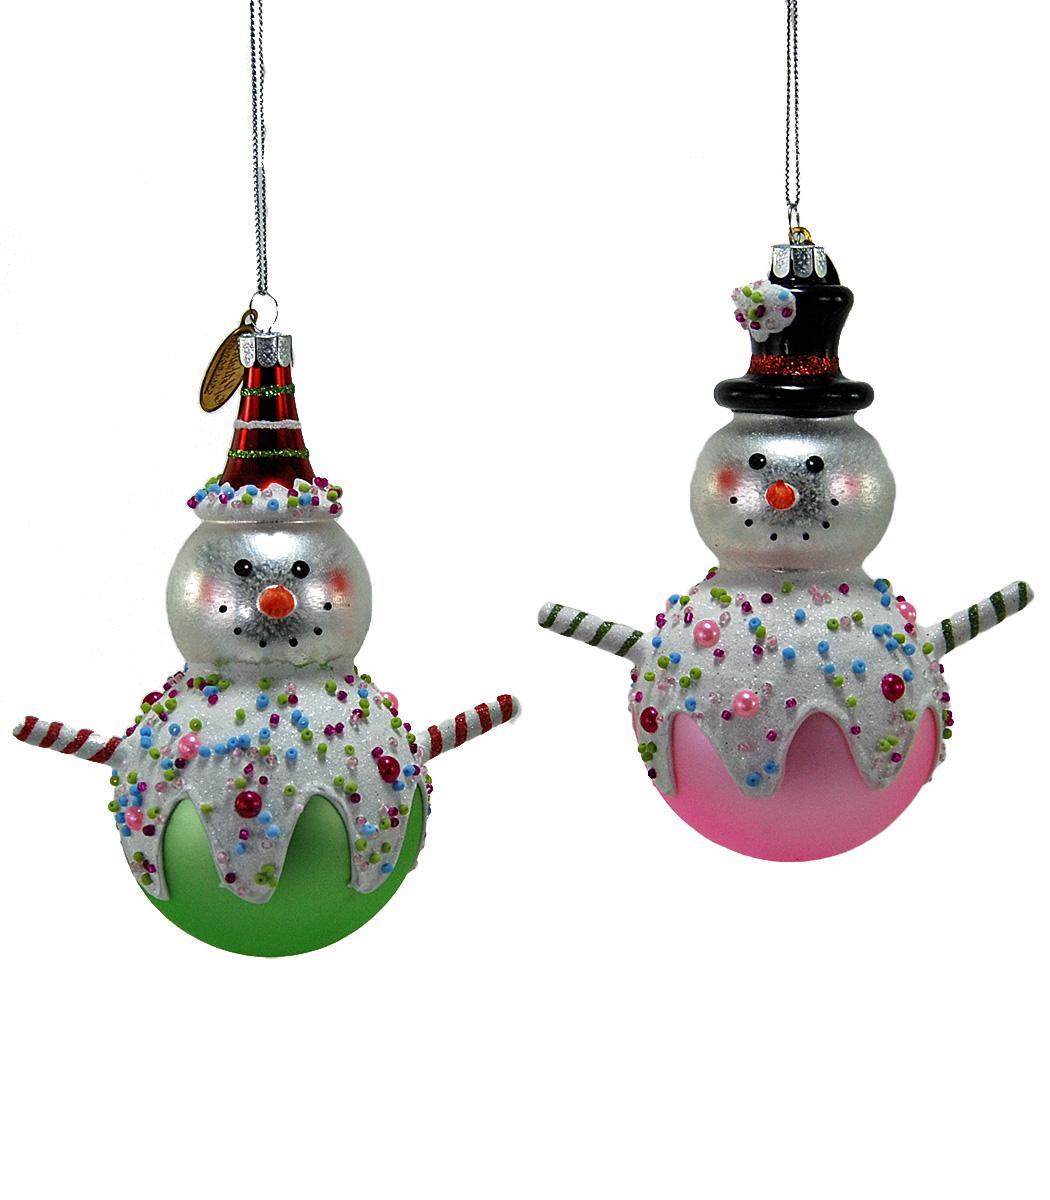 Candy Snowman Ornament - Assortment Of 2  22-524717